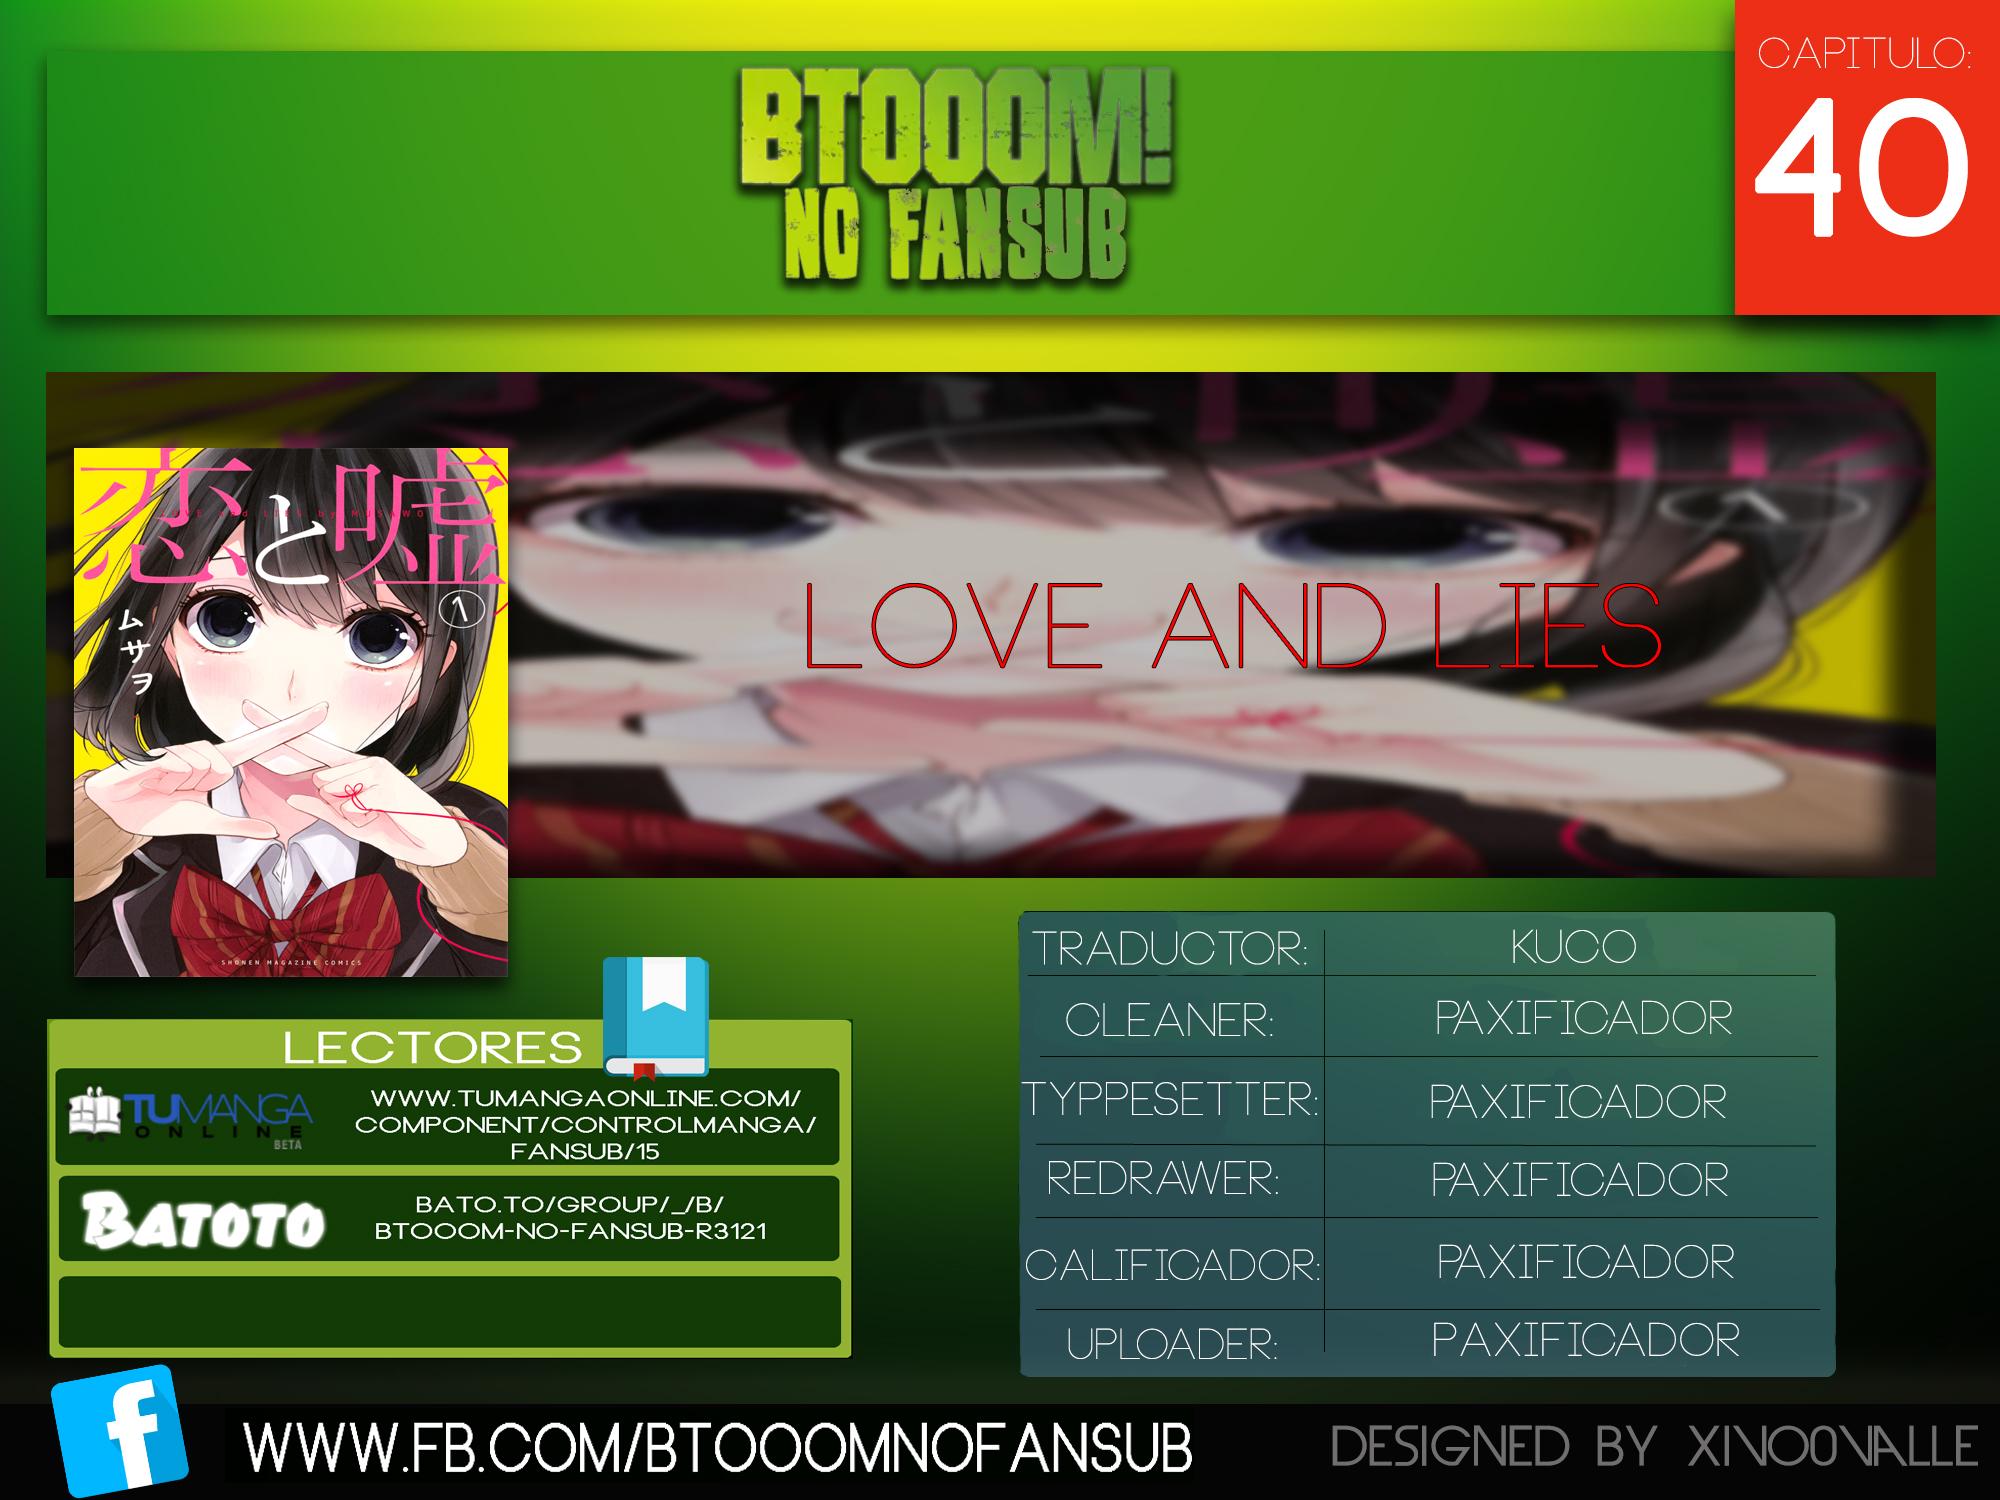 http://c5.ninemanga.com/es_manga/14/14734/383182/e9d7f4042b10ec7d4ab6e0635753c9f8.jpg Page 1